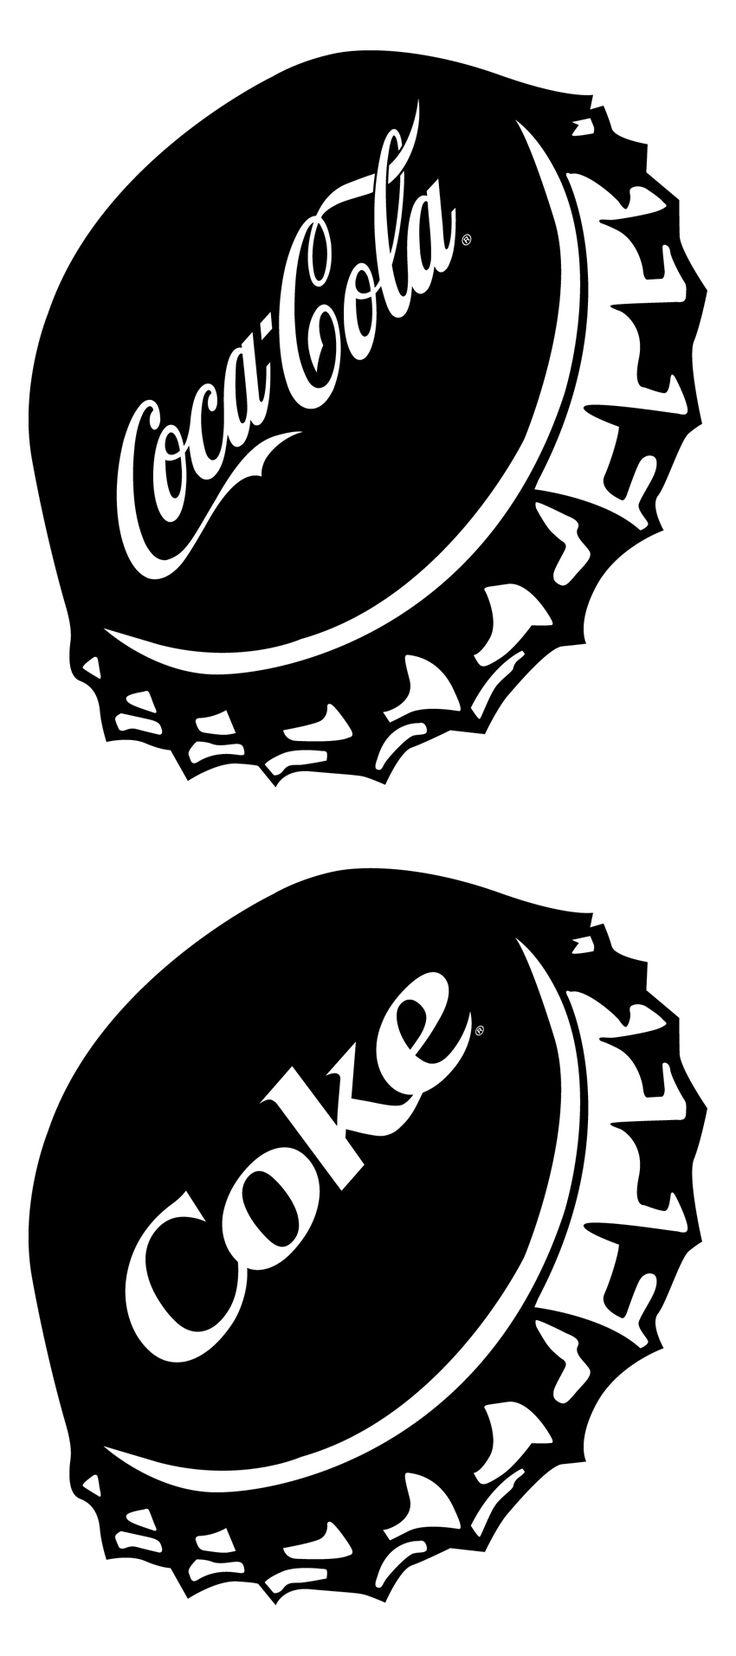 Coke Art Graphic Corner: Free Coca-Cola Vector Art, Images & Graphics «…